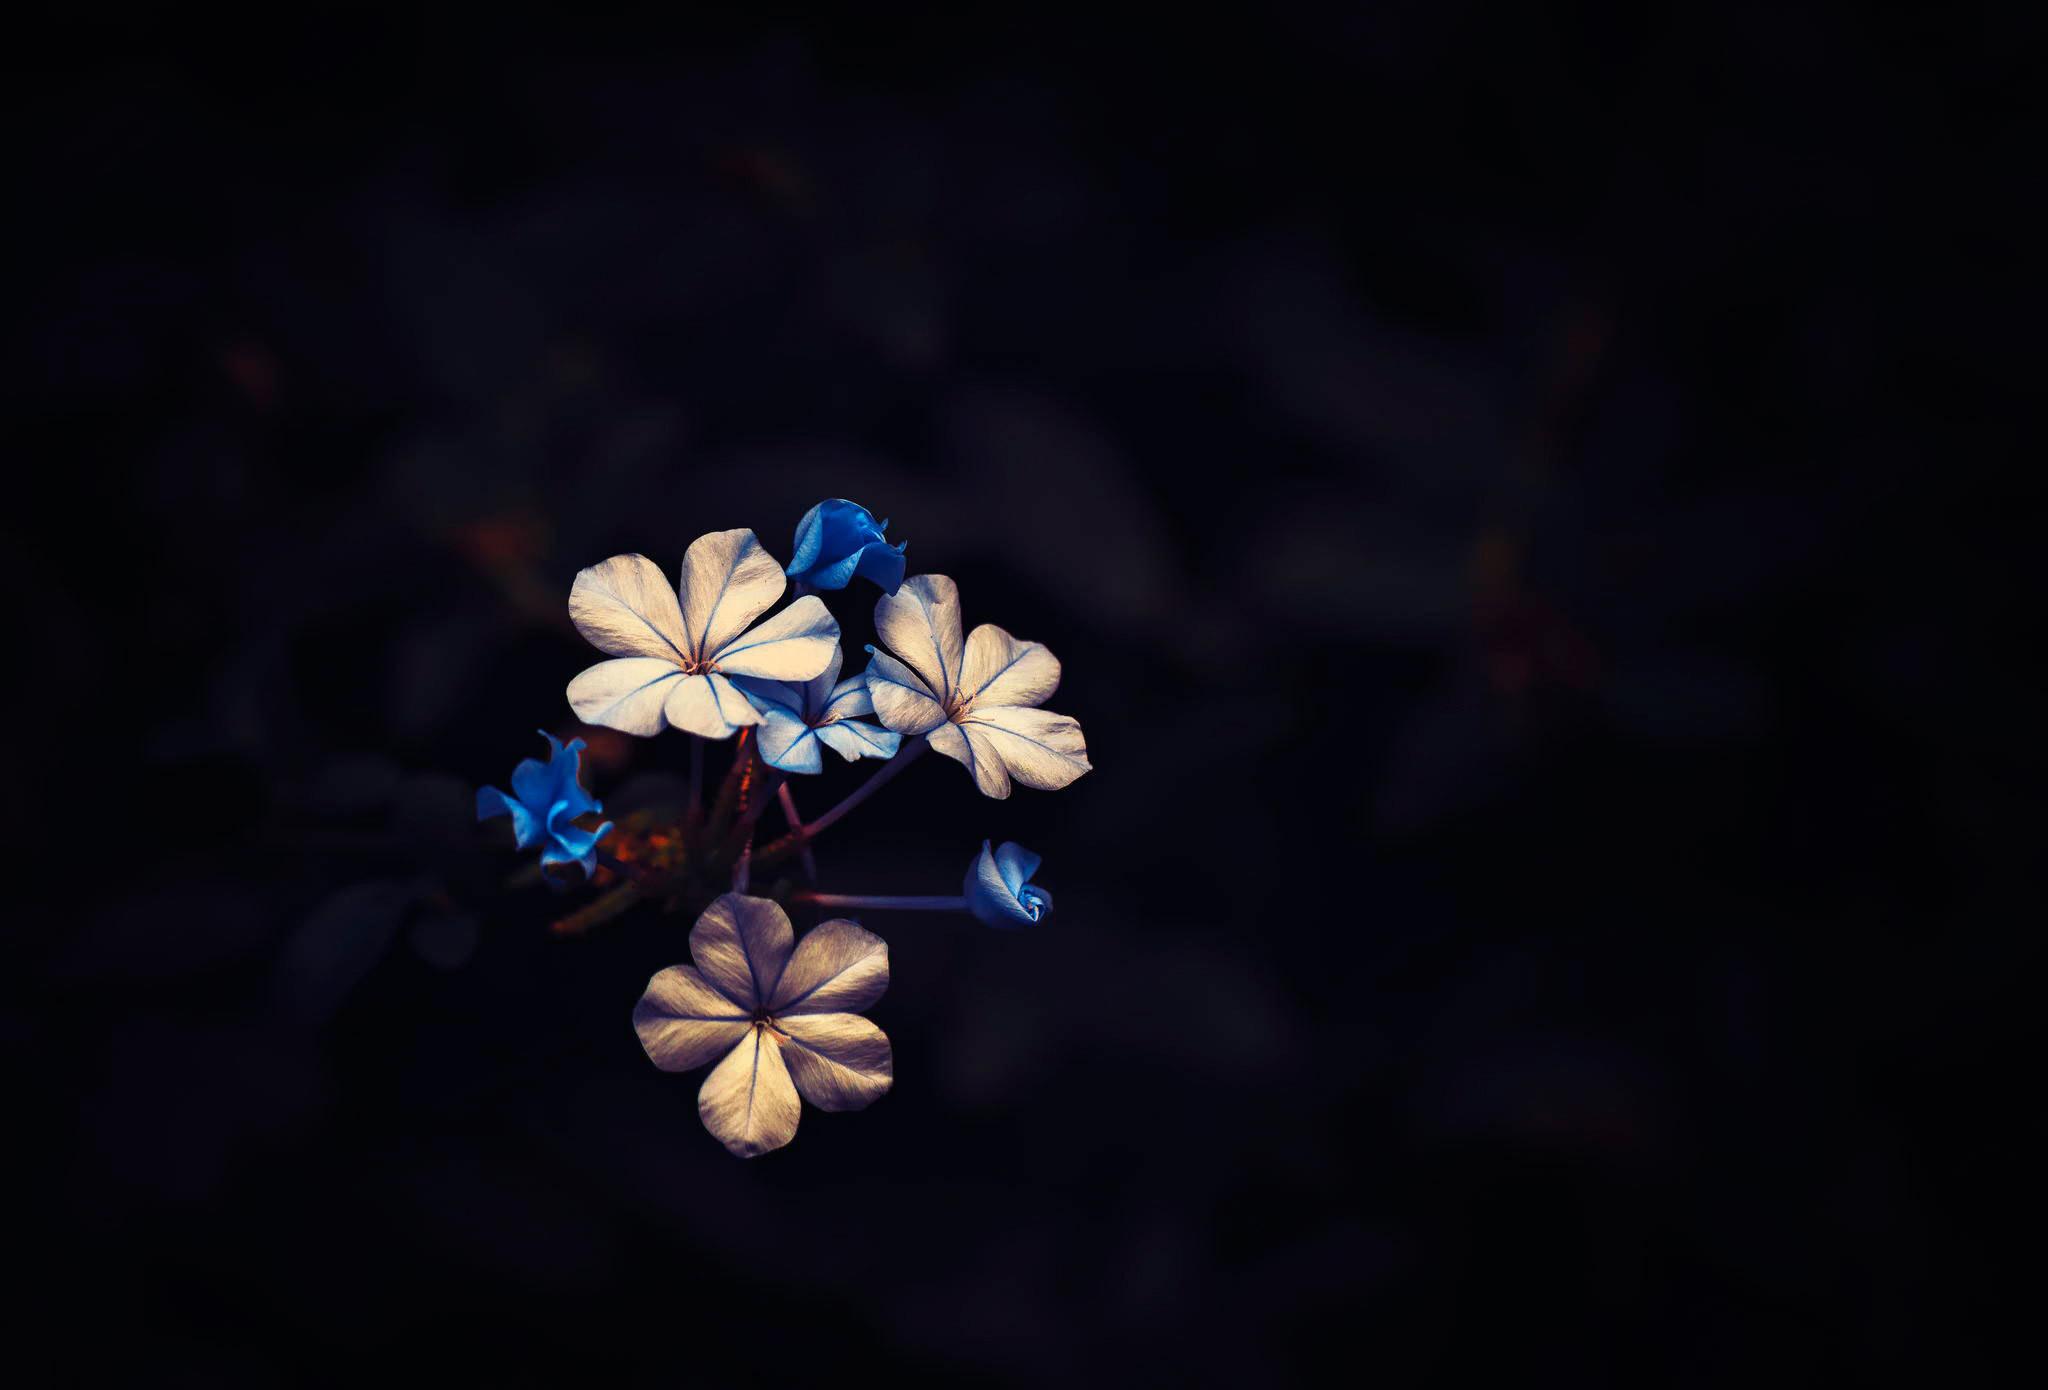 73 Flowers On Black Background